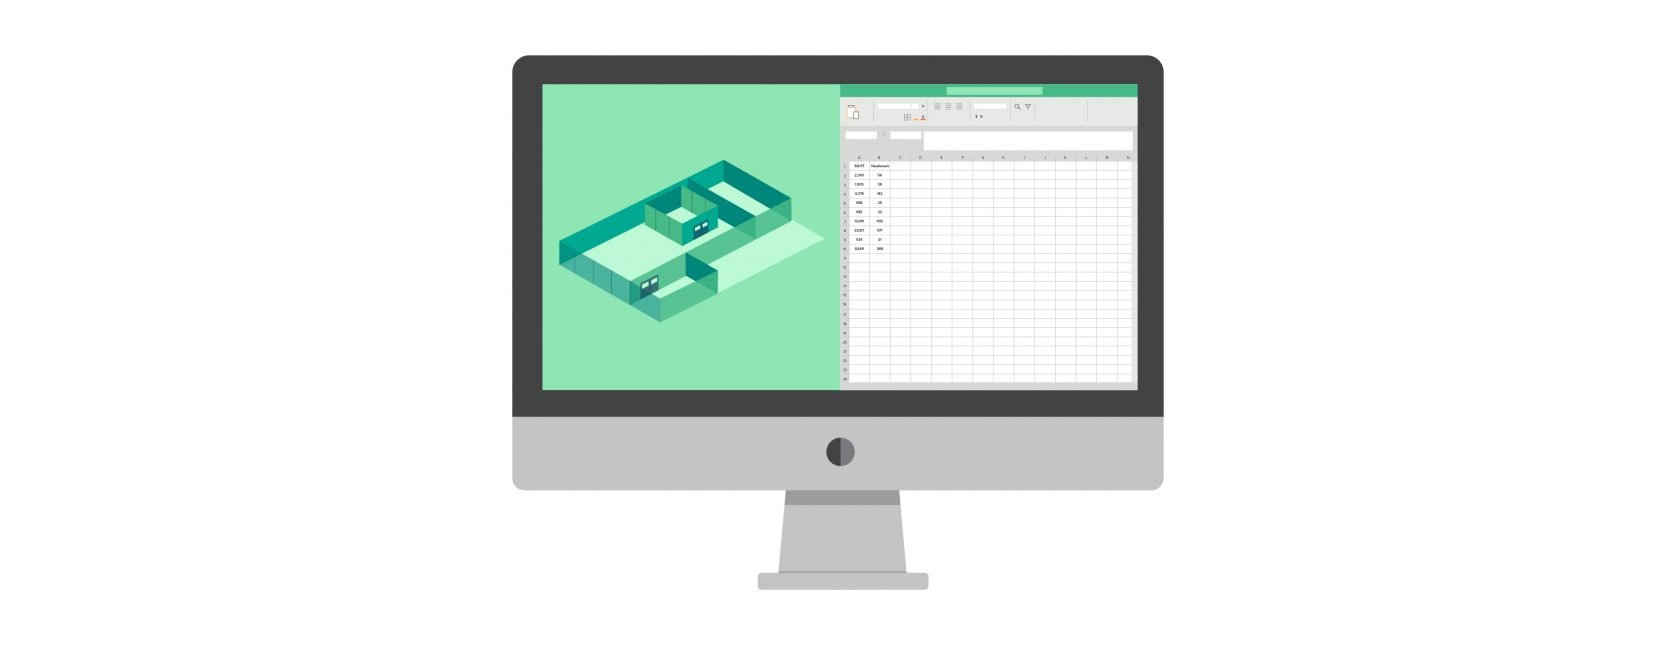 BIM VDC Spatial Planning